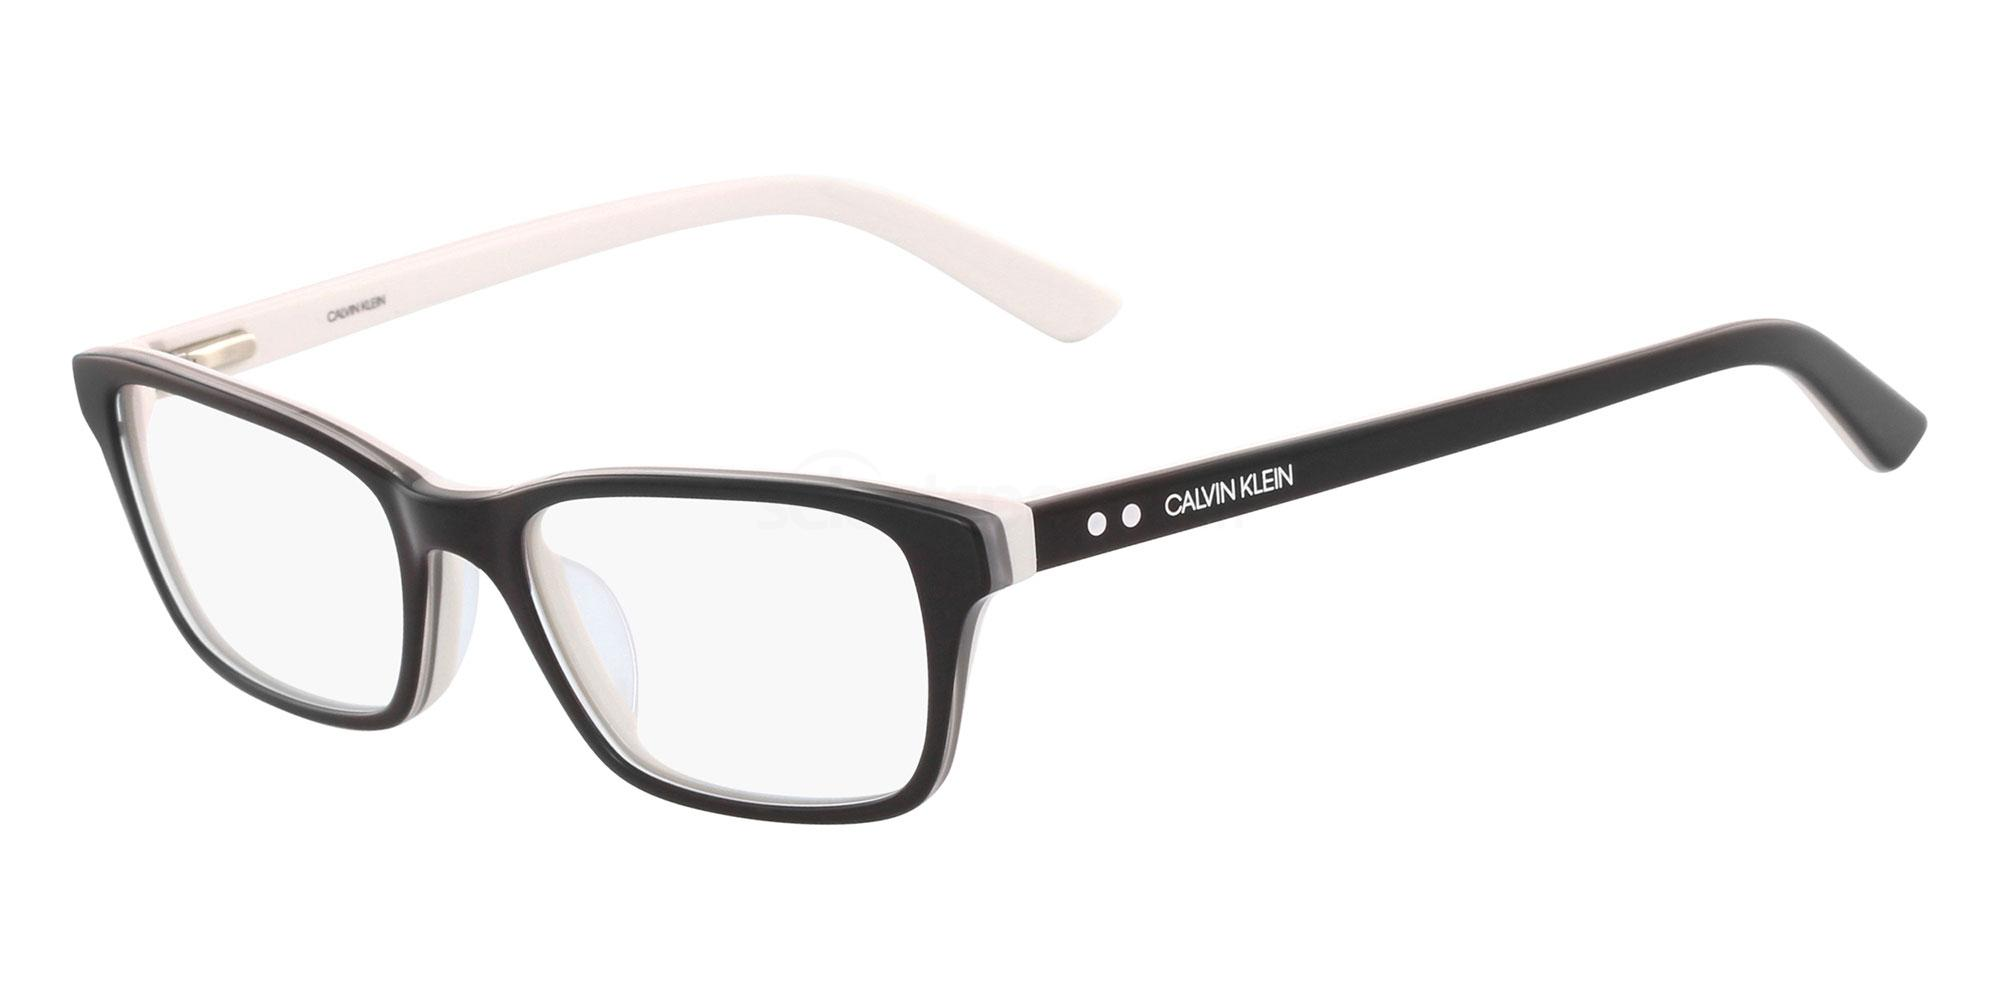 002 CK18541 Glasses, Calvin Klein